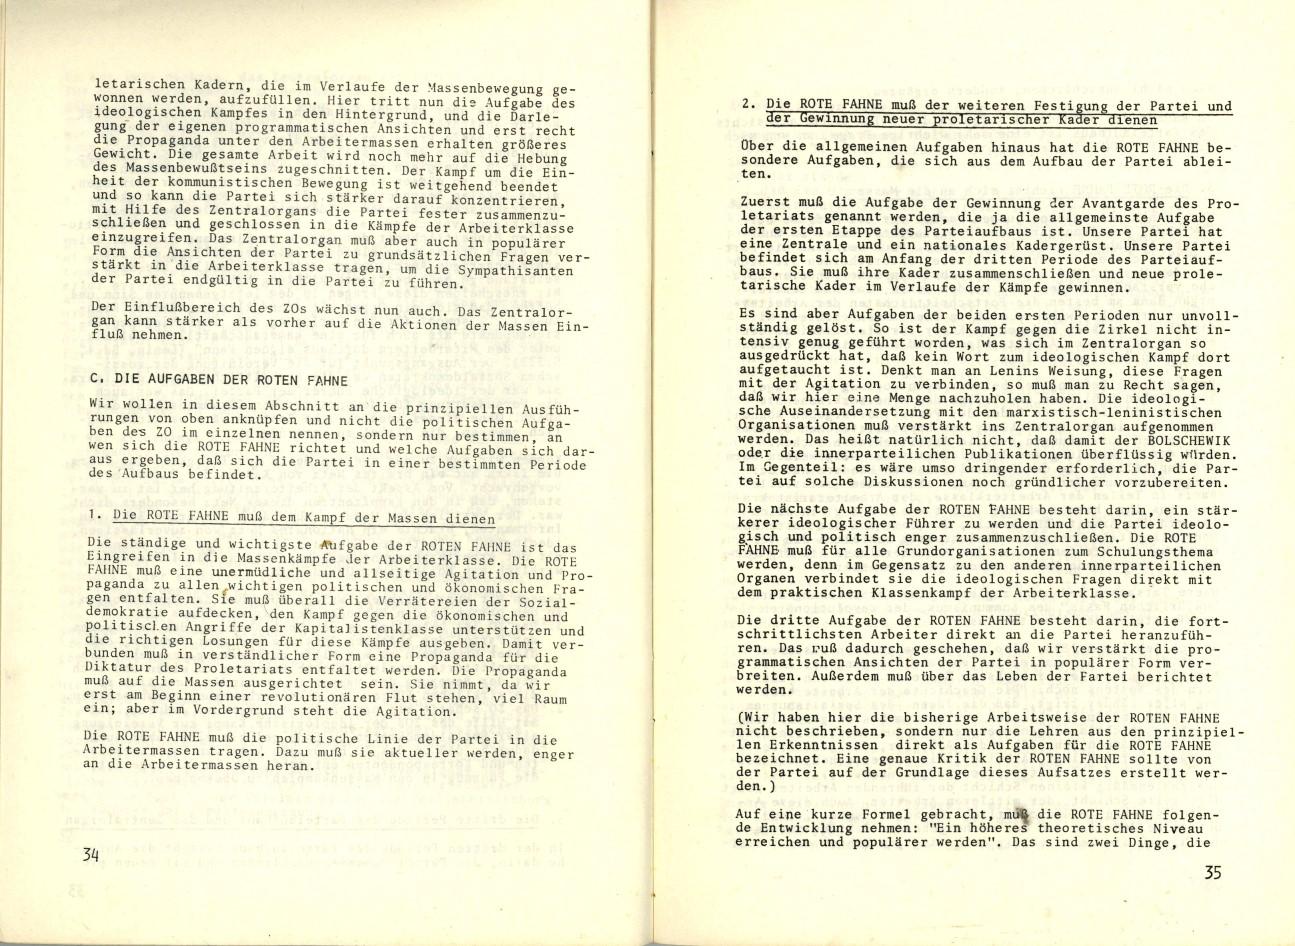 ZB_Parteiarbeiter_1971_06_19